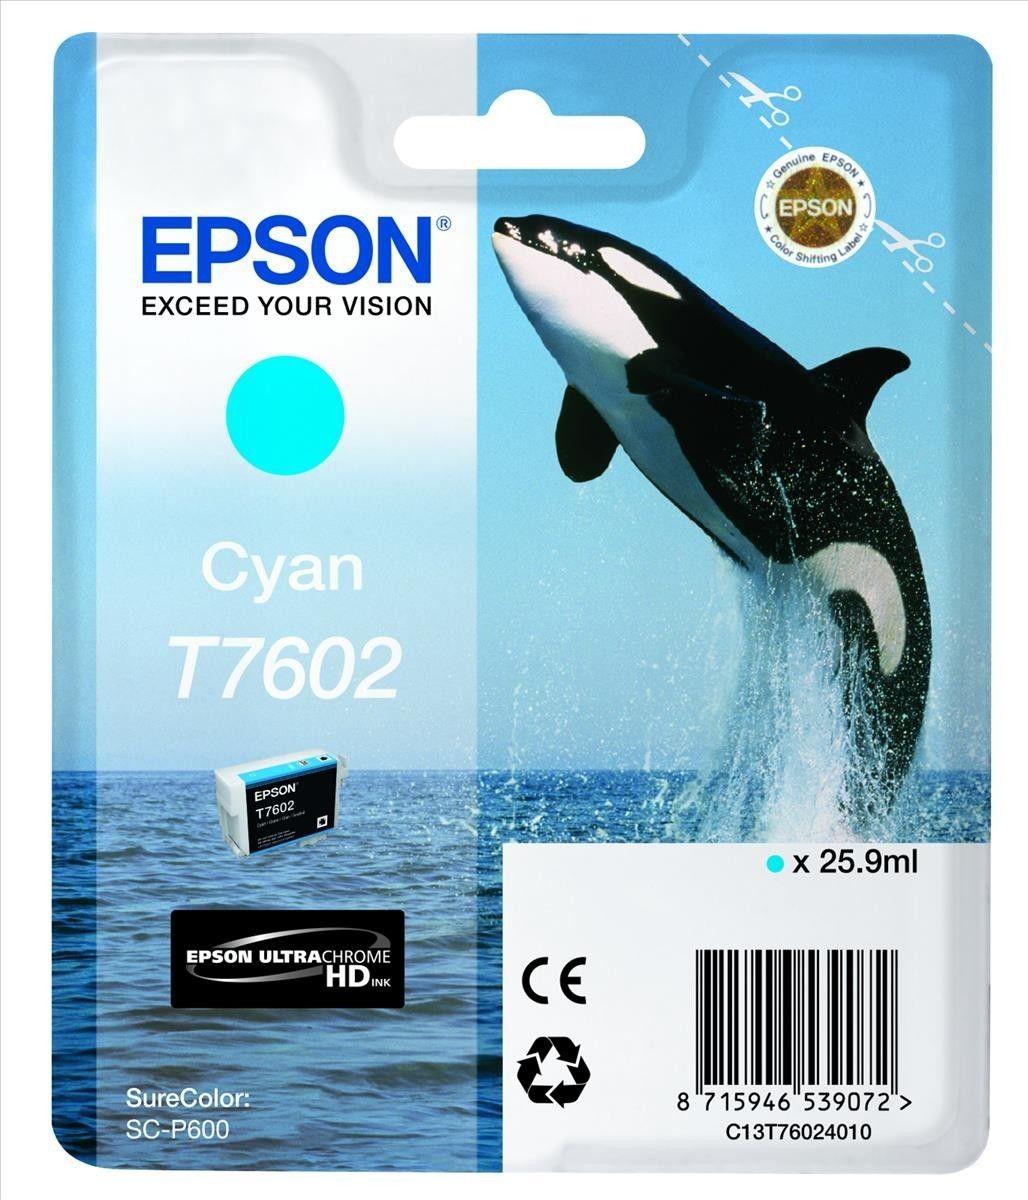 Epson Tusz Singlepack Cyan | SureColor SC-P600